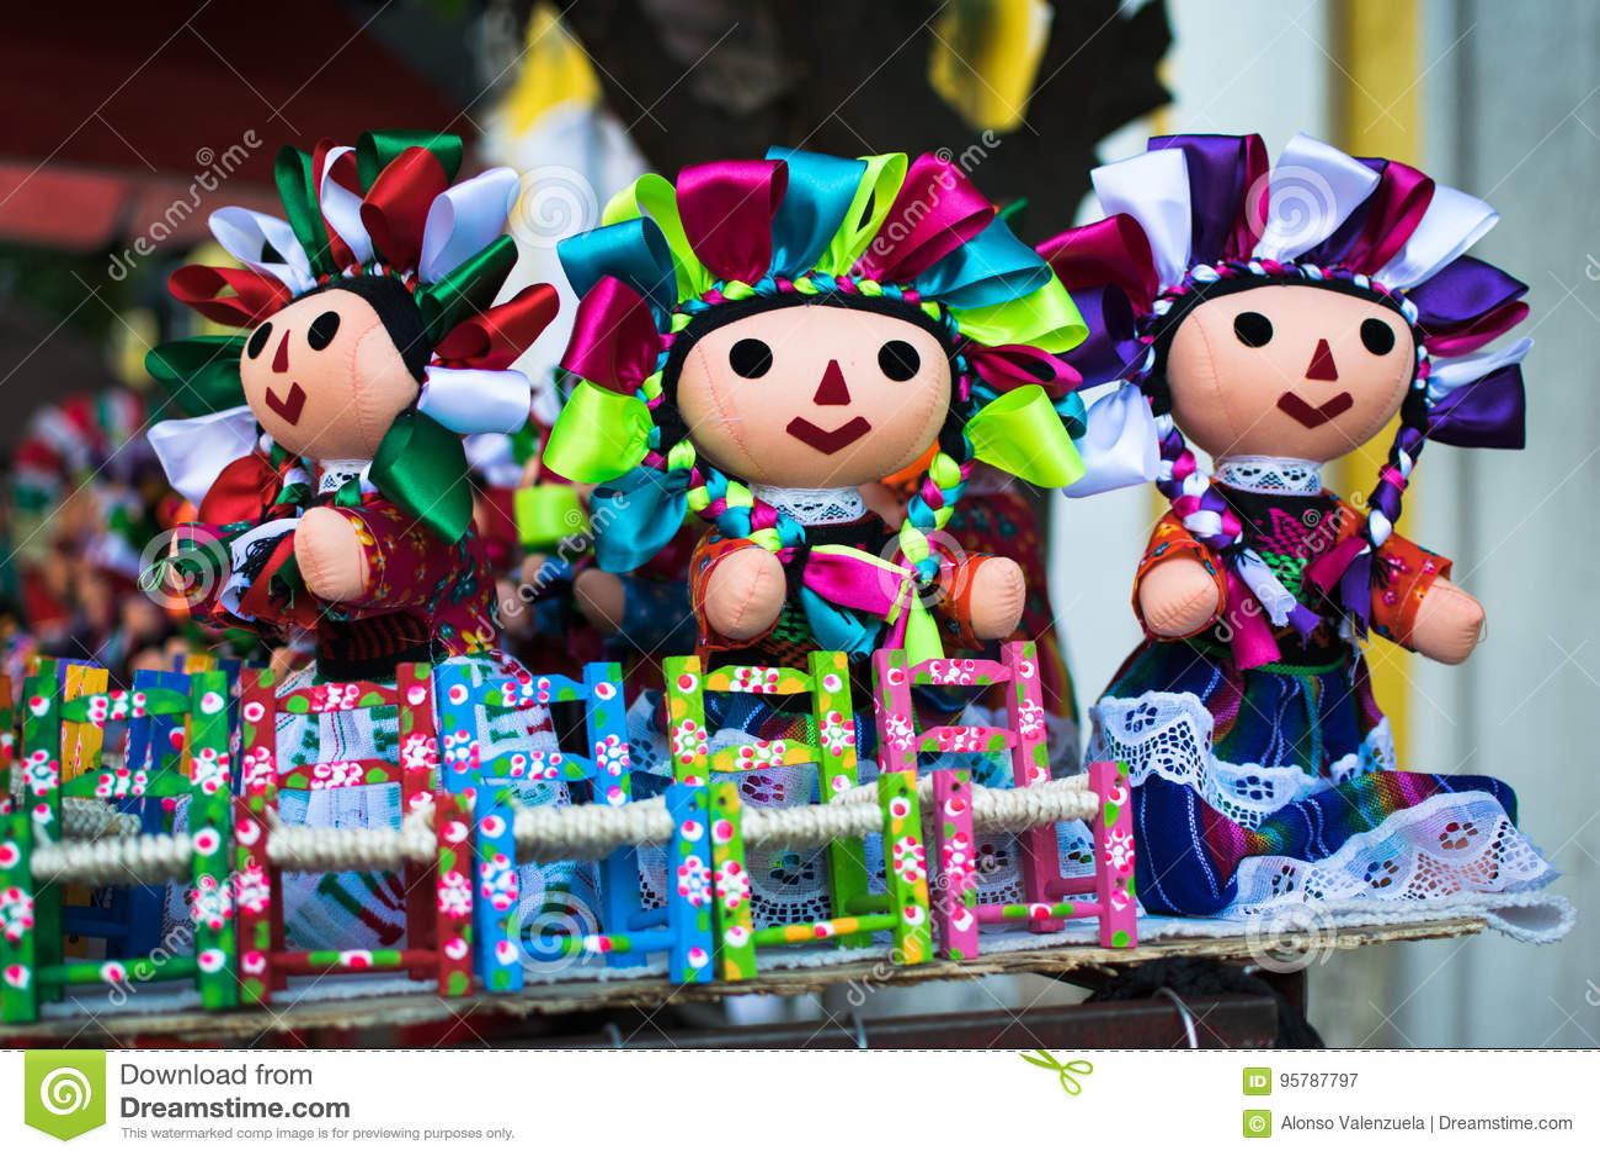 Meksykańskie lalki